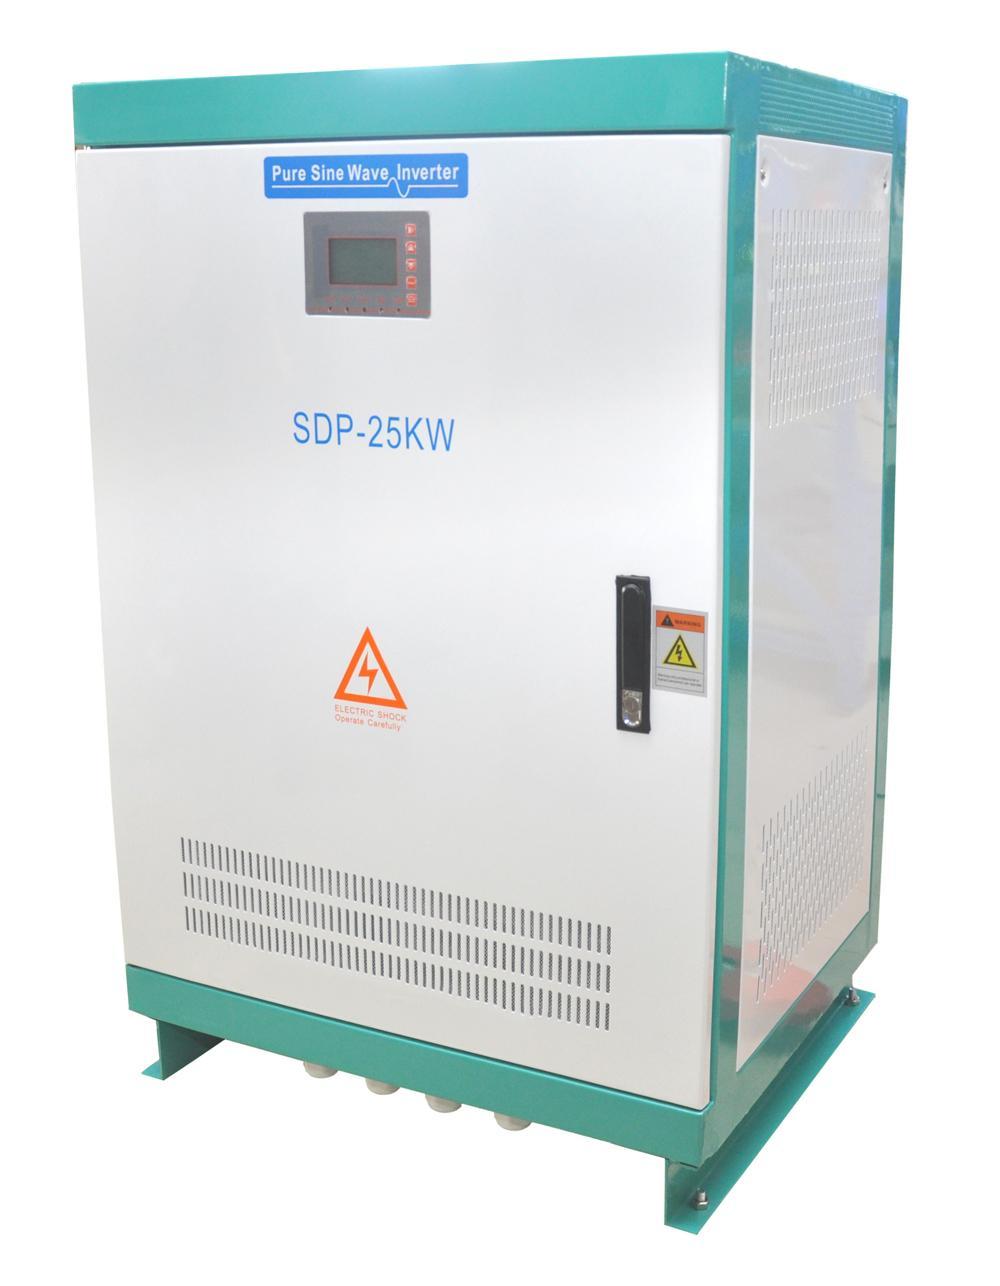 25kW Pure Sine Wave Split-phase Inverter